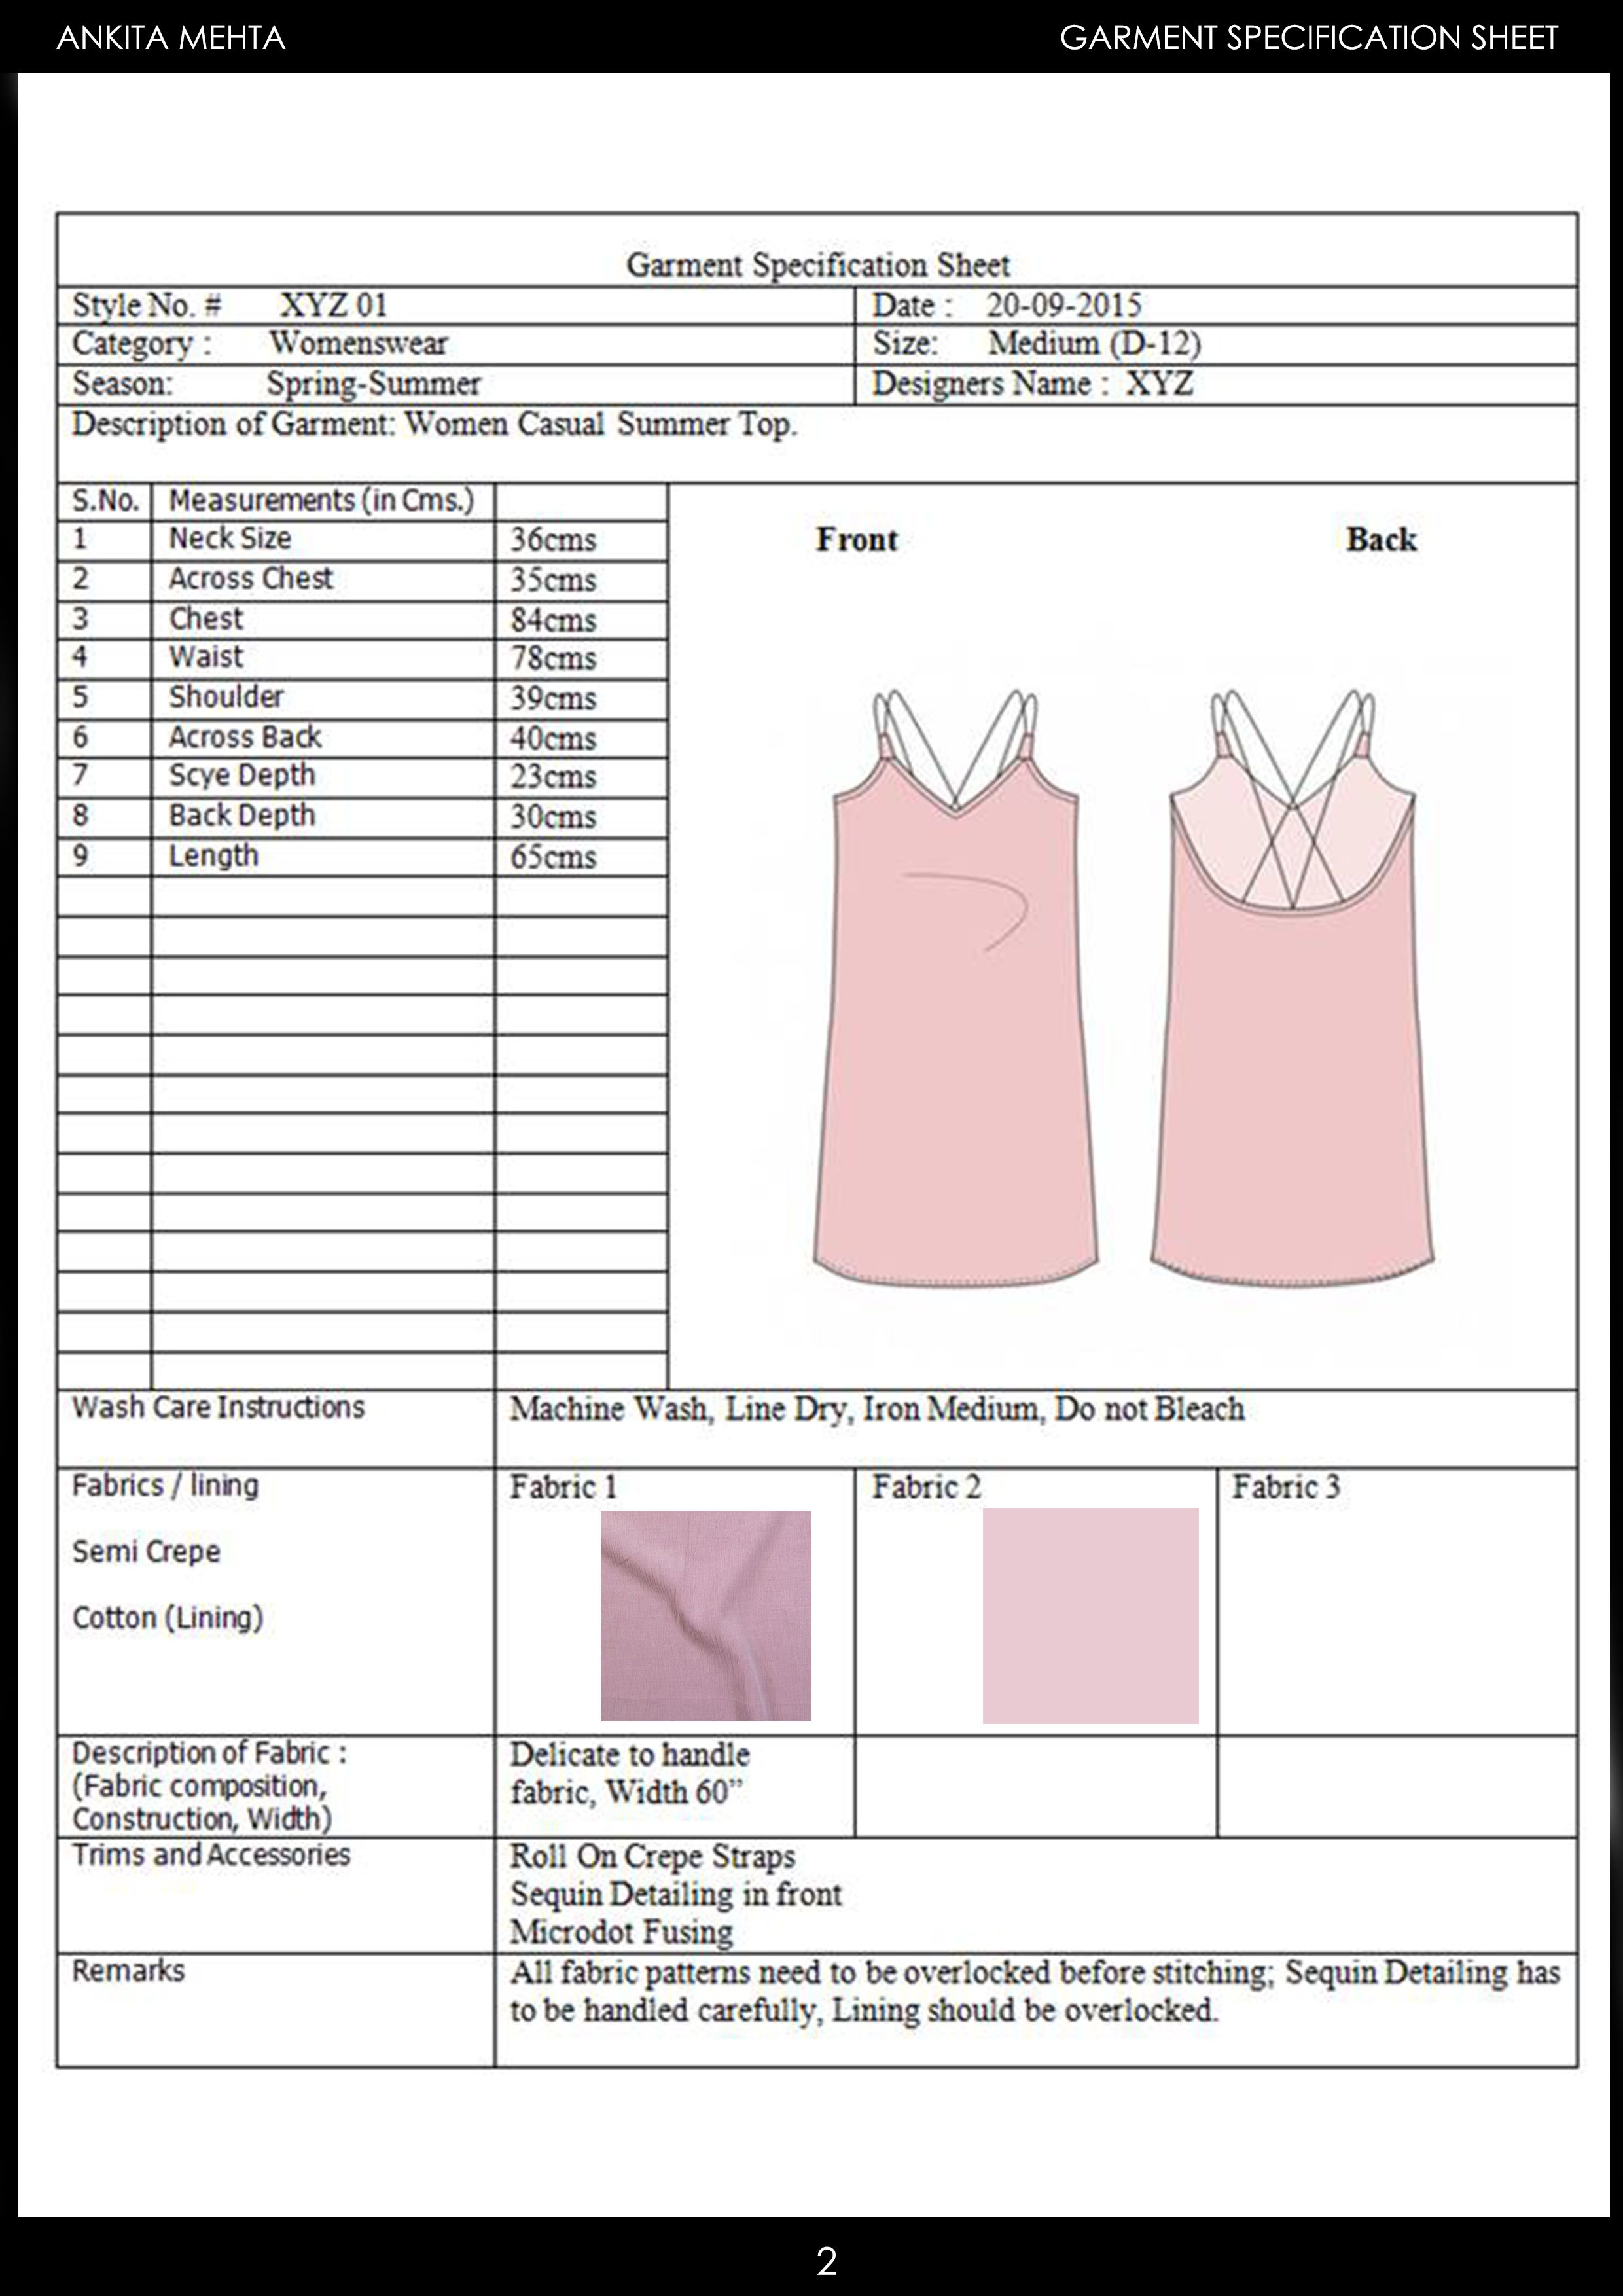 Womenswear Casual Summer Top Garment Specification Sheet